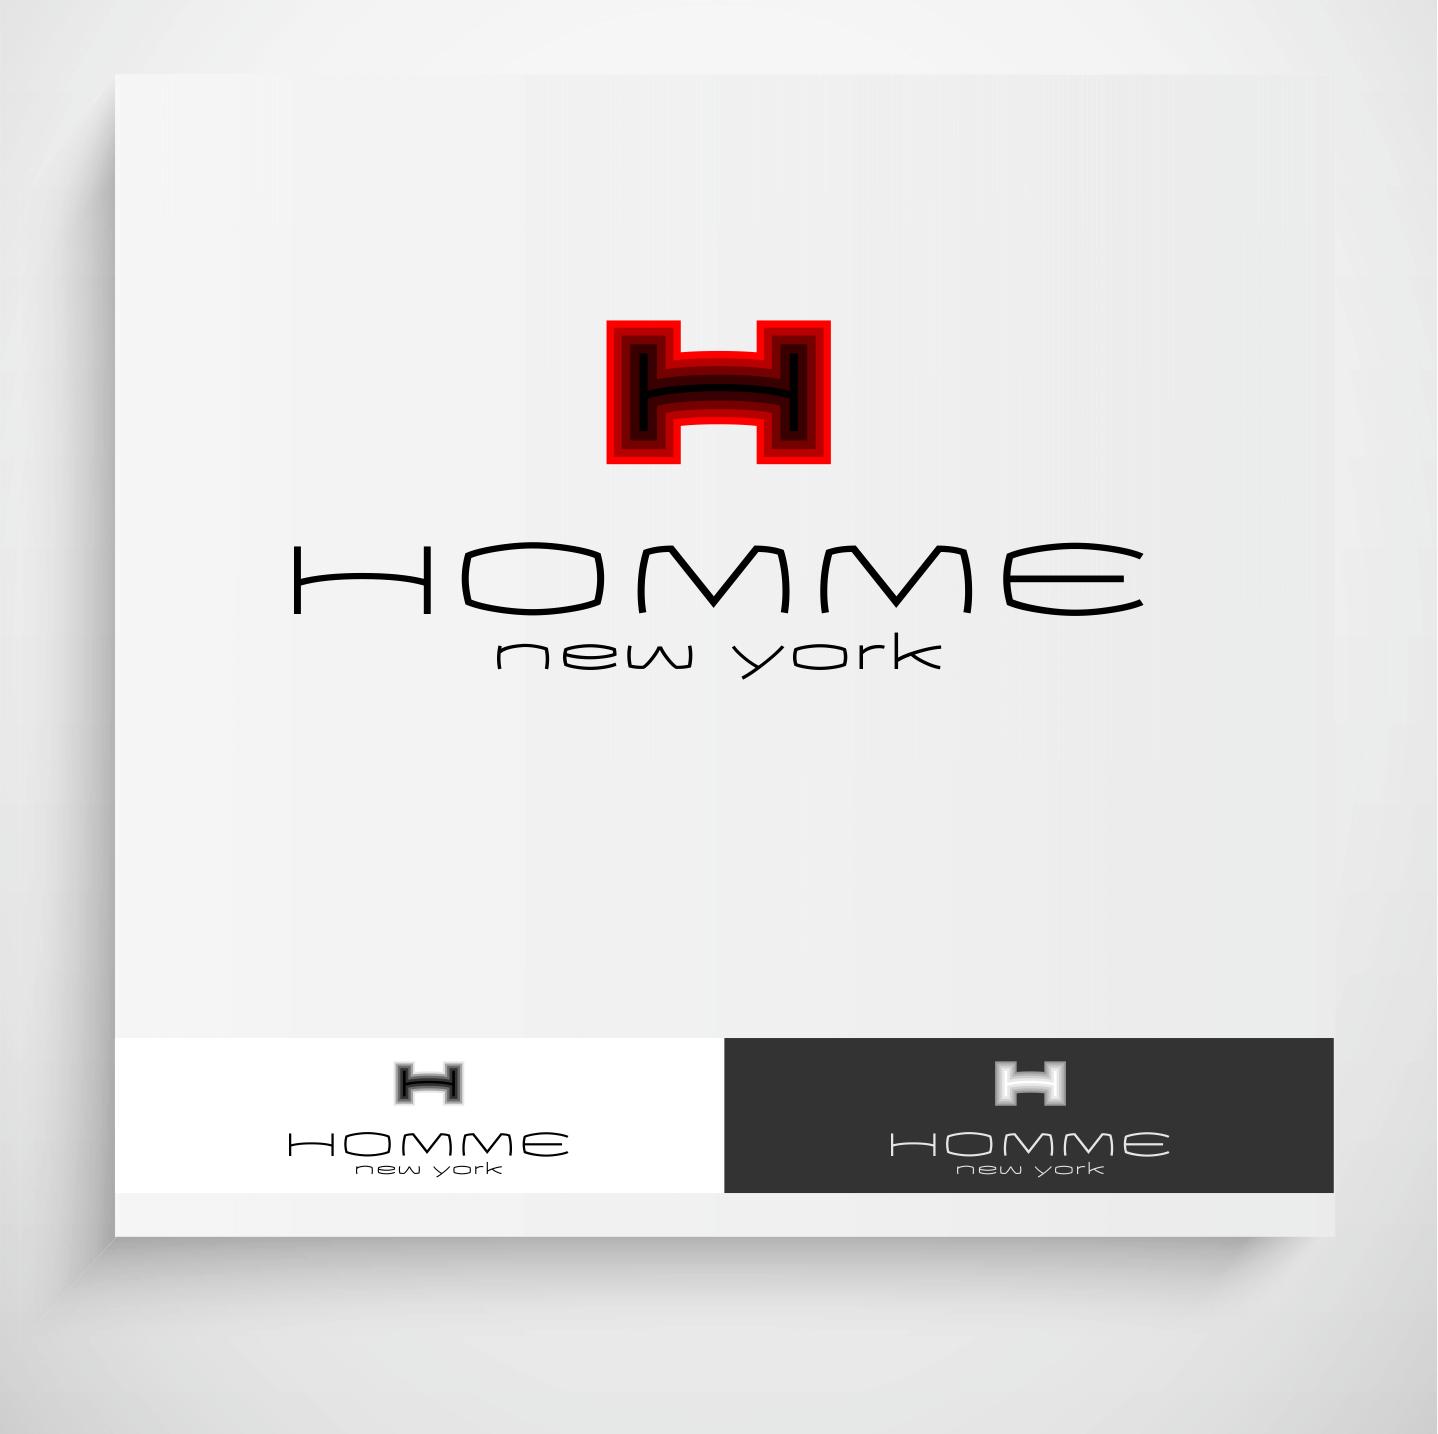 Logo Design by Krzysztof Mokanek - Entry No. 93 in the Logo Design Contest Artistic Logo Design for HOMME | NEW YORK.